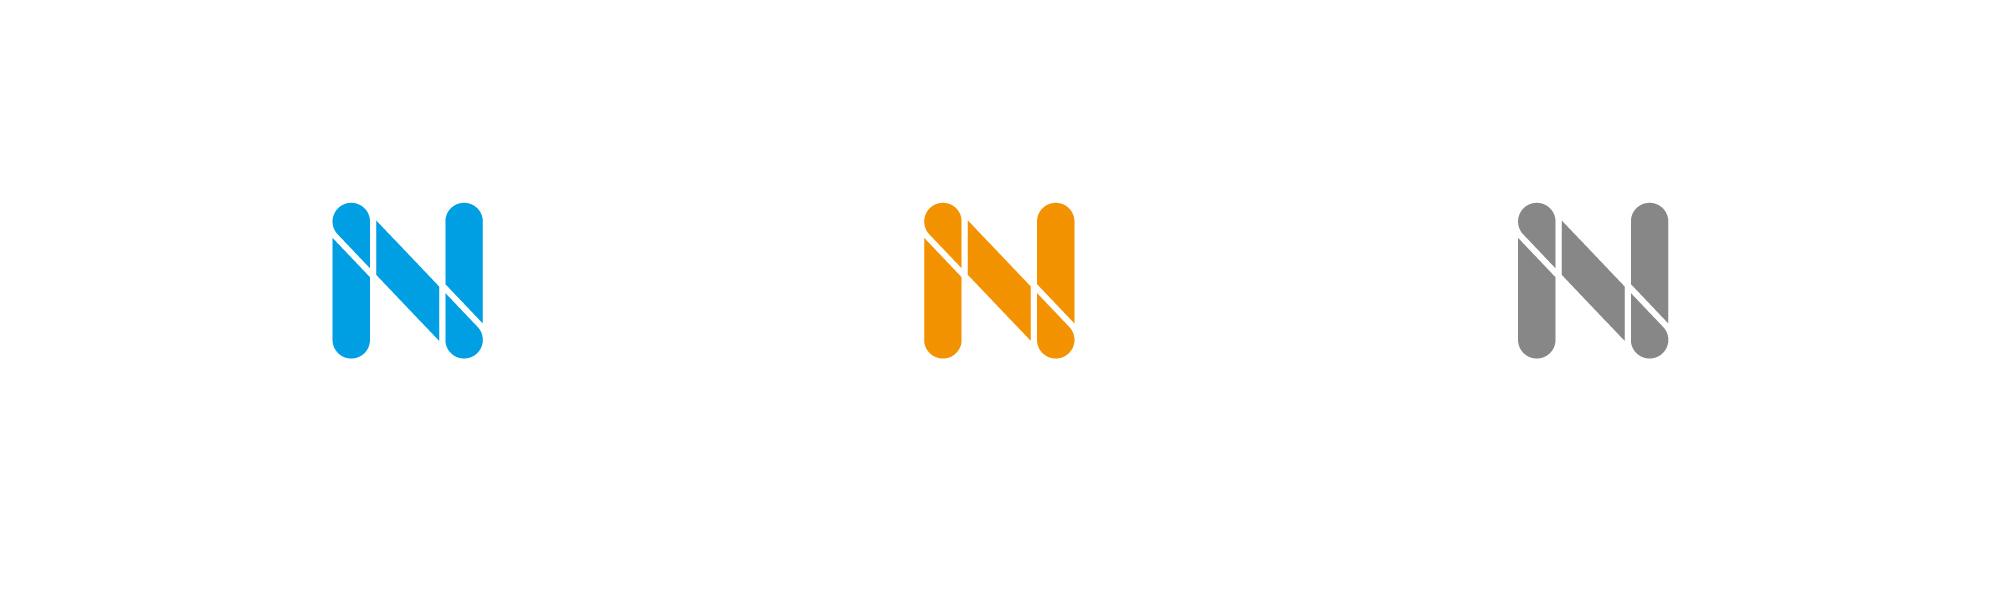 NewJob-branding-02